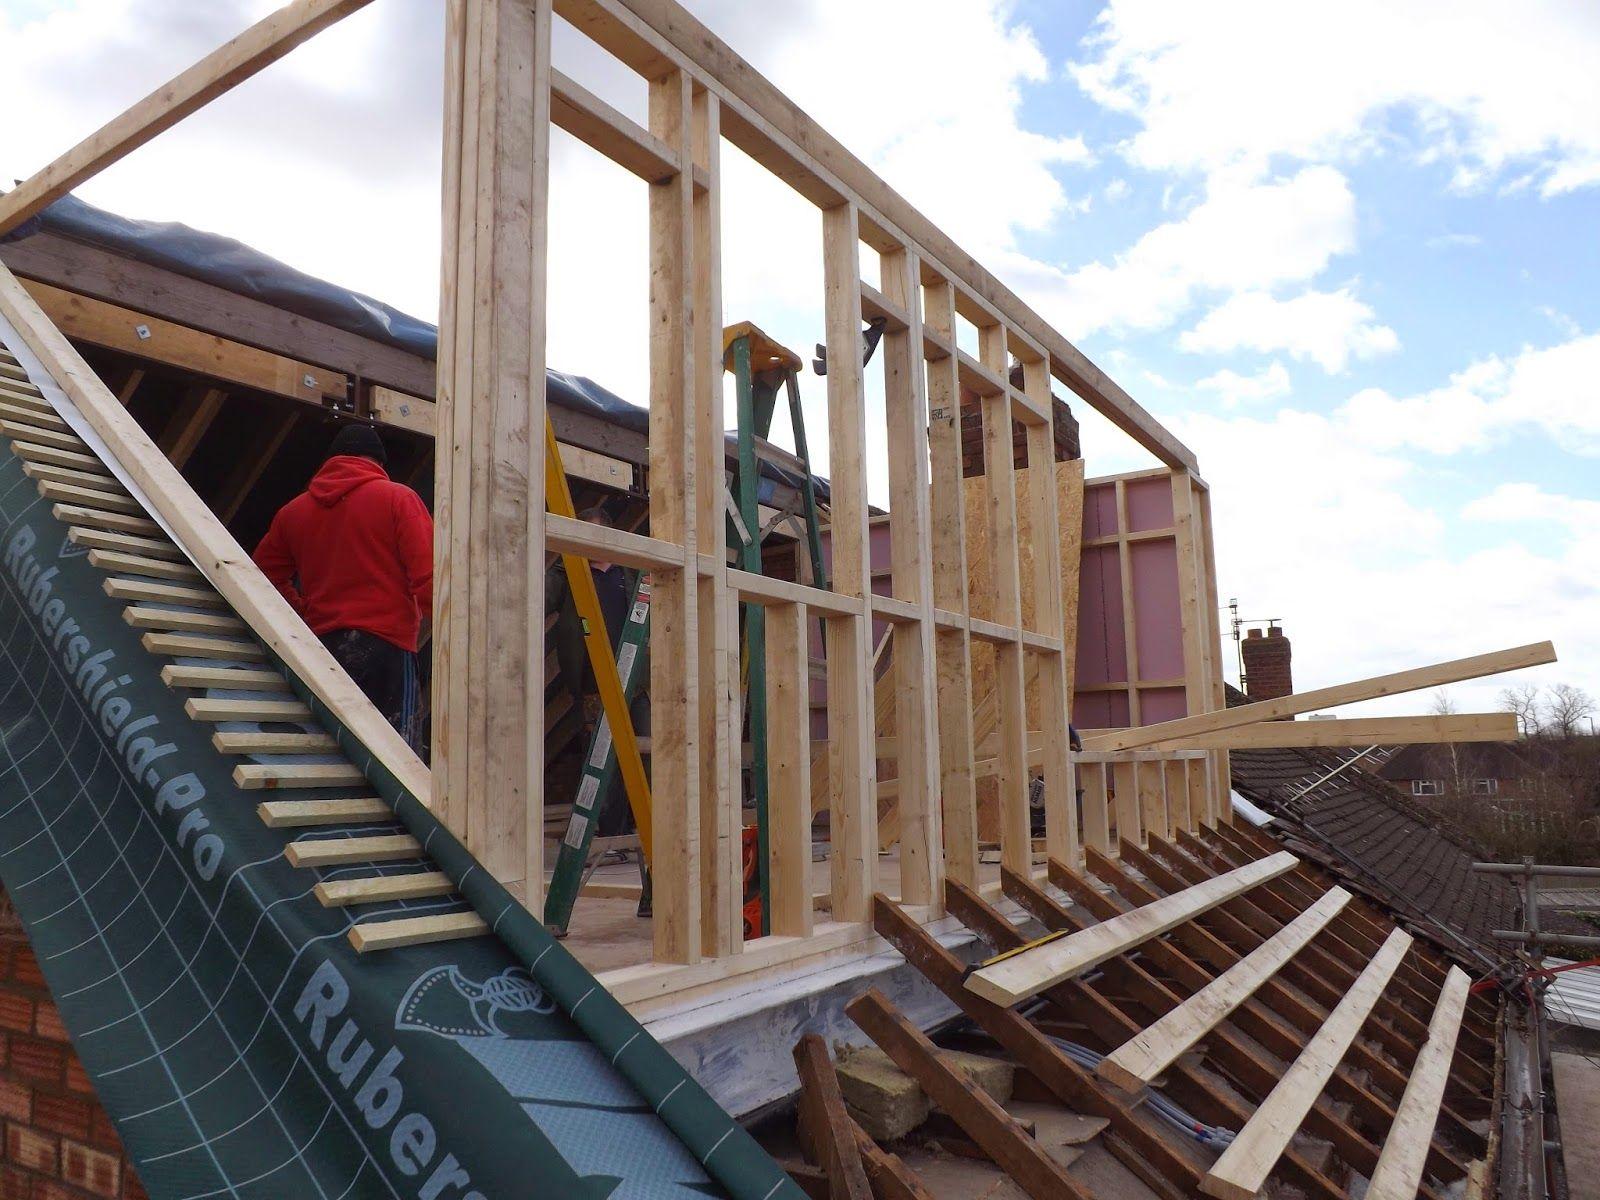 Clc Lofts Stratford On Avon Hip To Gable Loft Conversion Dormer Loft Conversion Loft Conversion Dormers